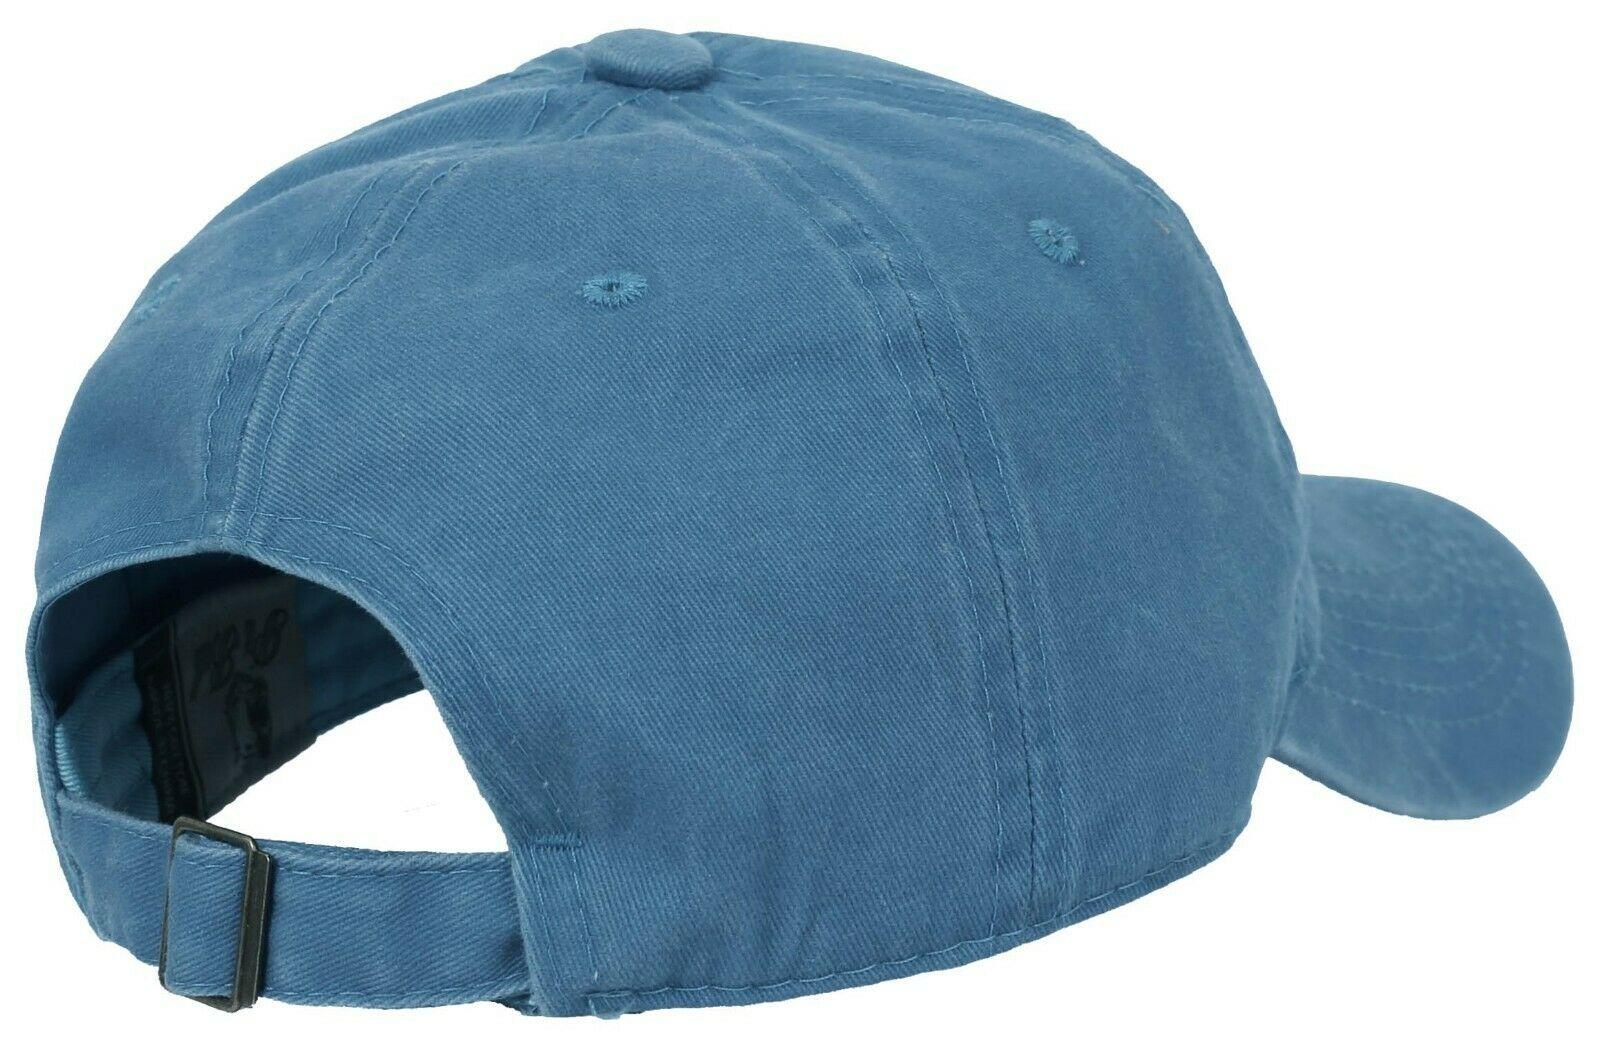 BASEBALL-CAP-Plain-Dad-Hat-Low-Profile-Vintage-Washed-Pigment-Adjustable thumbnail 21